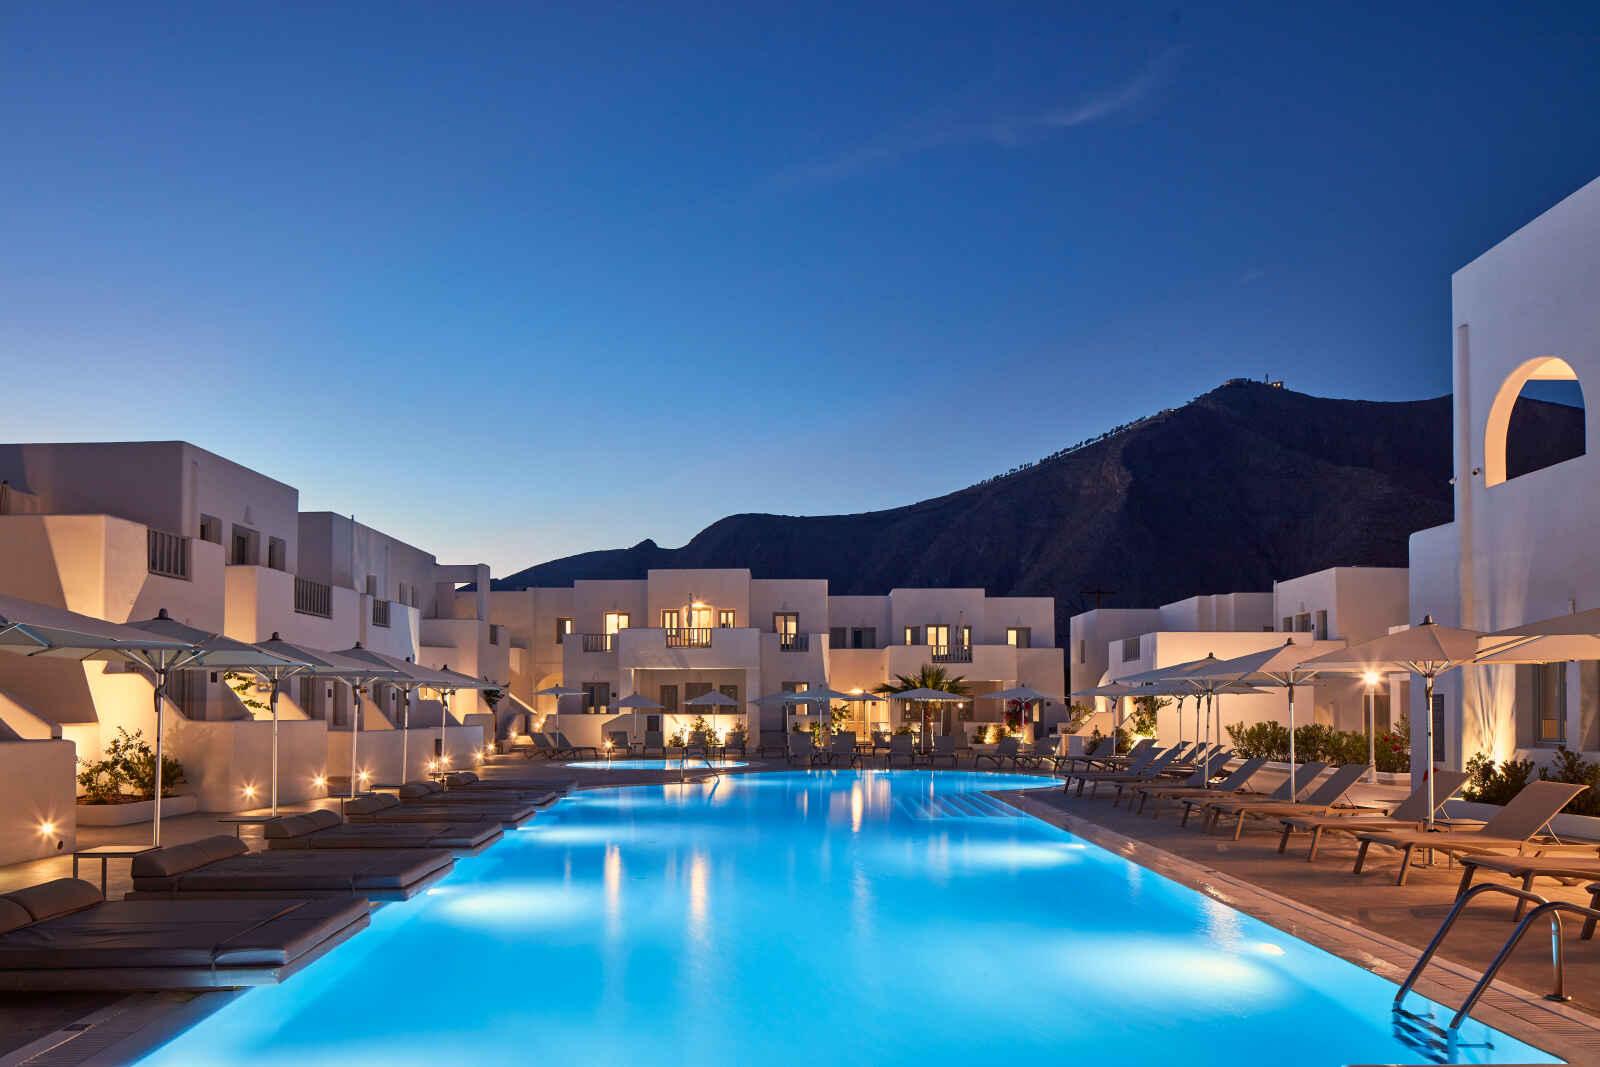 Grèce : Aqua Blue Hotel